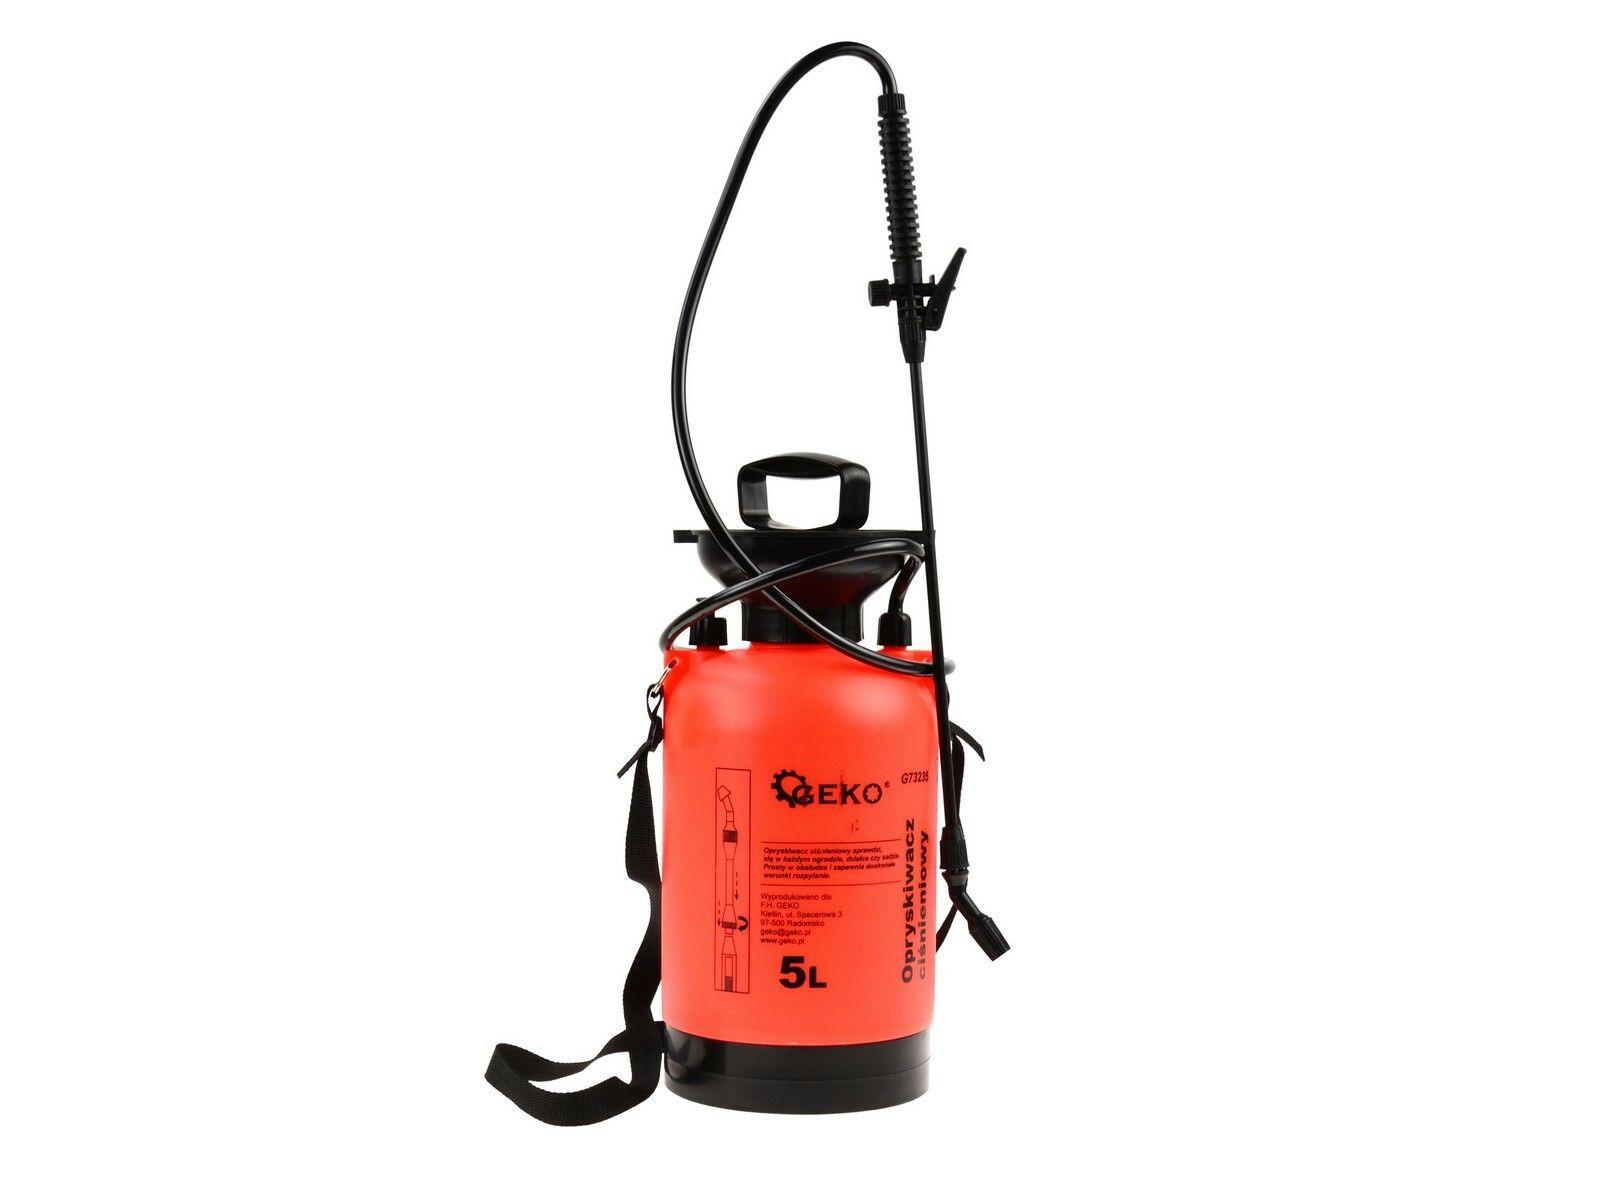 GEKO G73235 Postřikovač tlakový zahradní, 5l